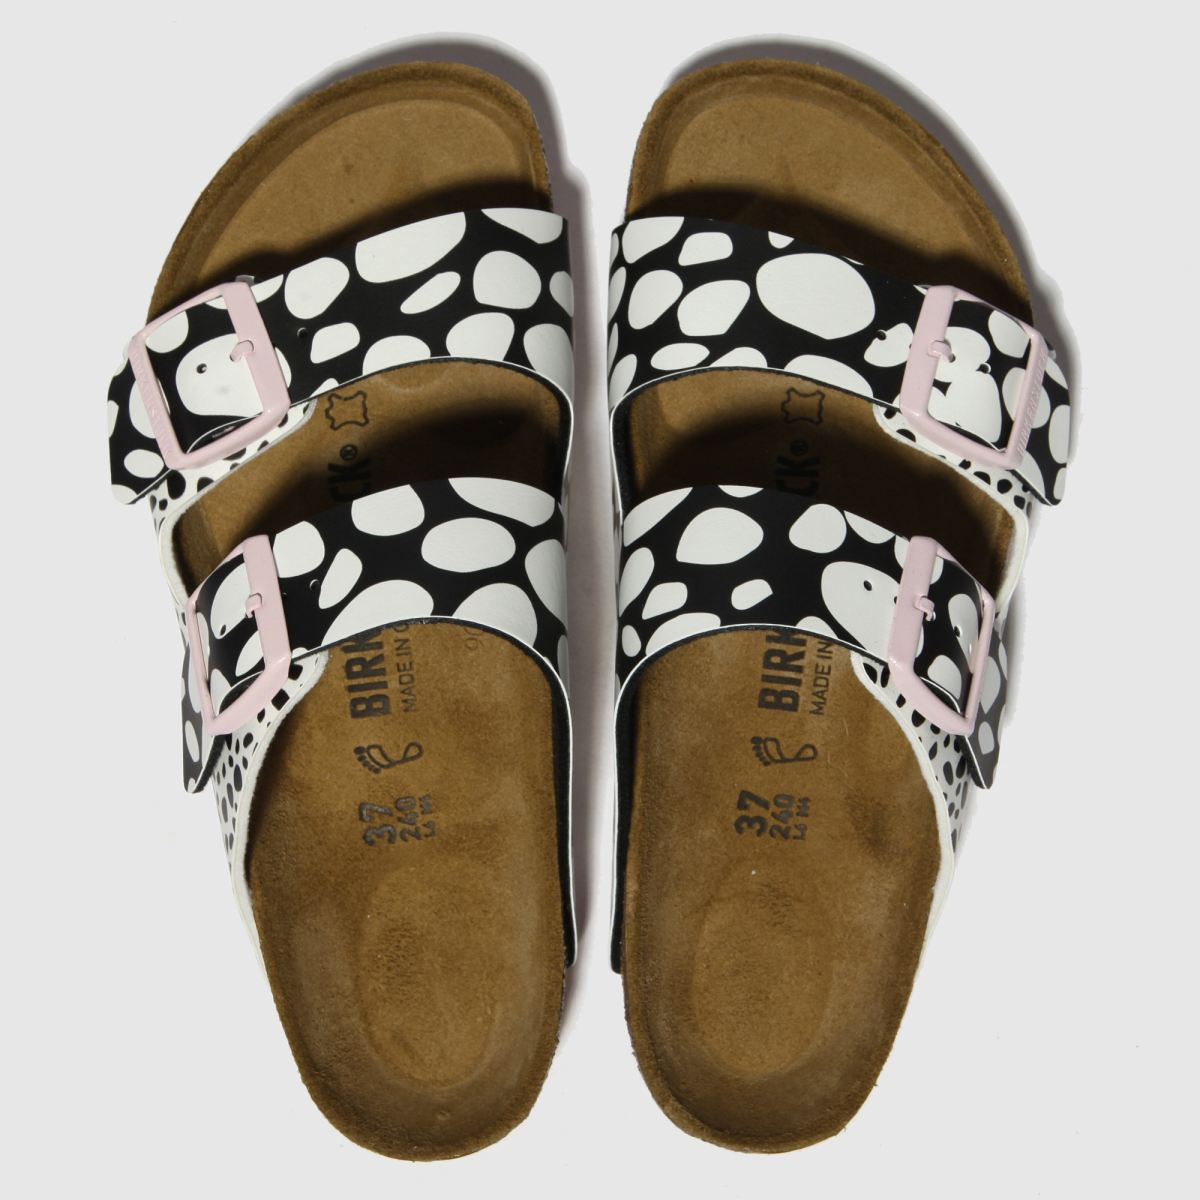 Birkenstock Black & White Arizona Sandals